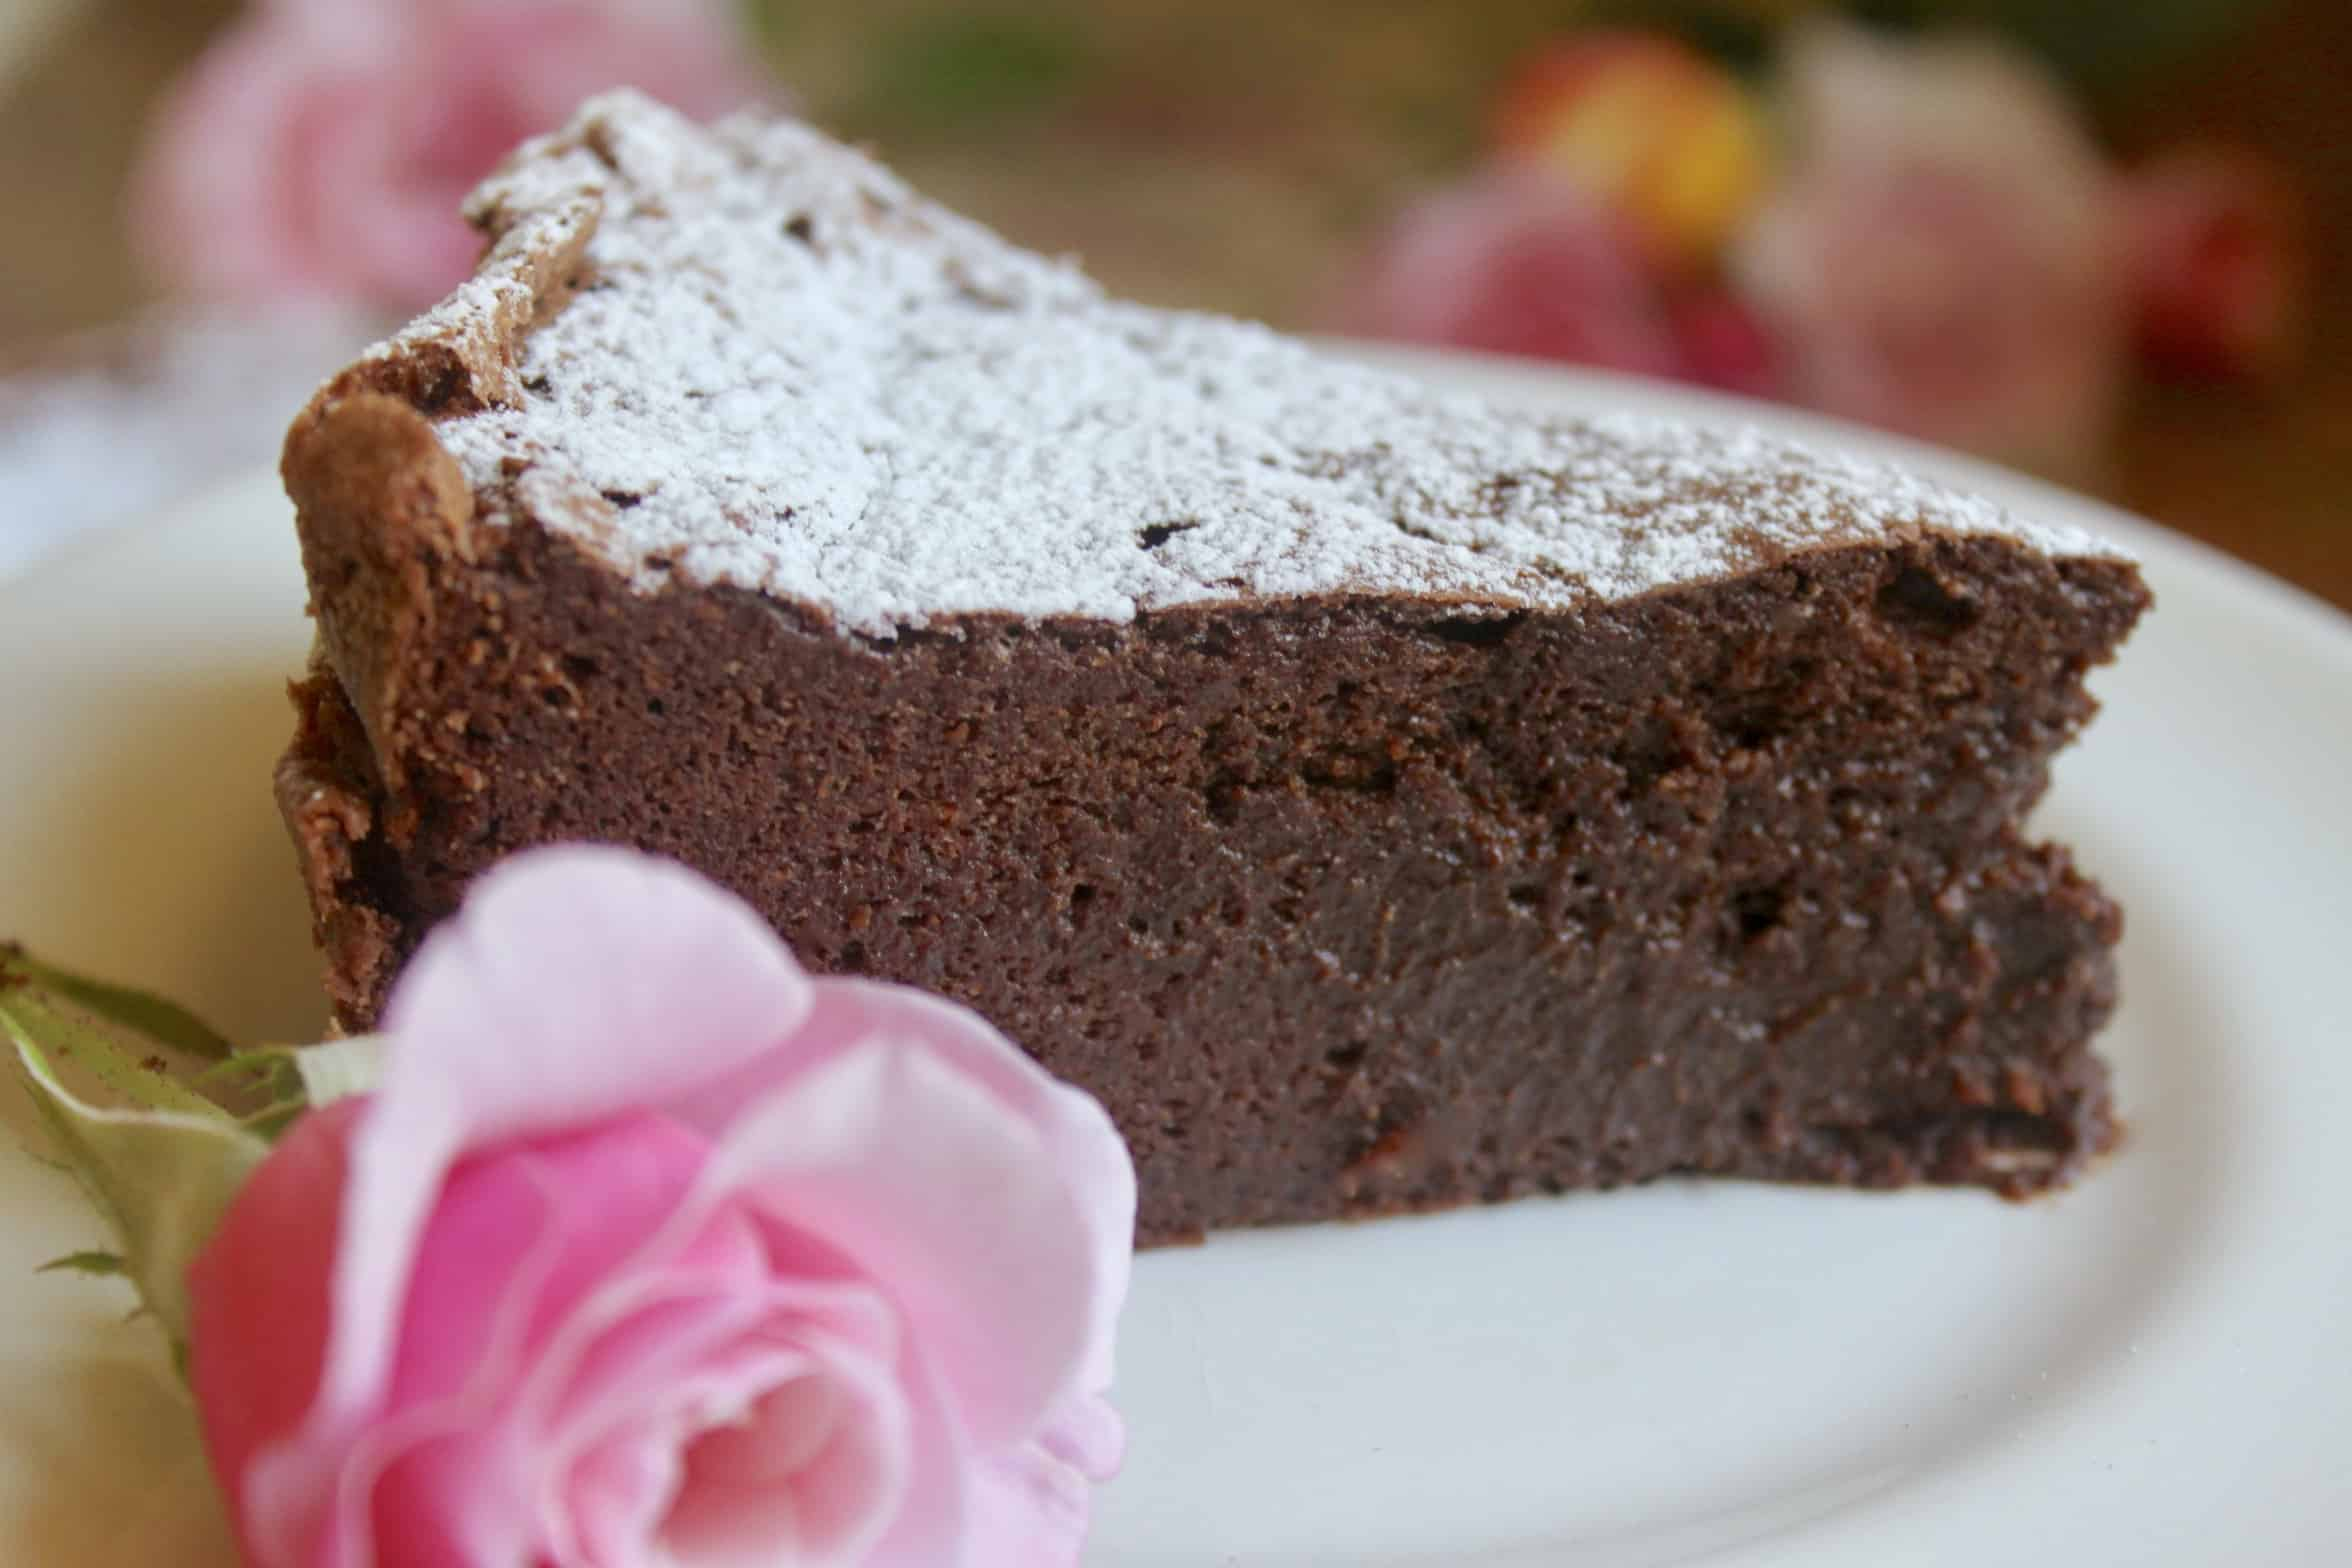 flourless chocolate torte on a plate